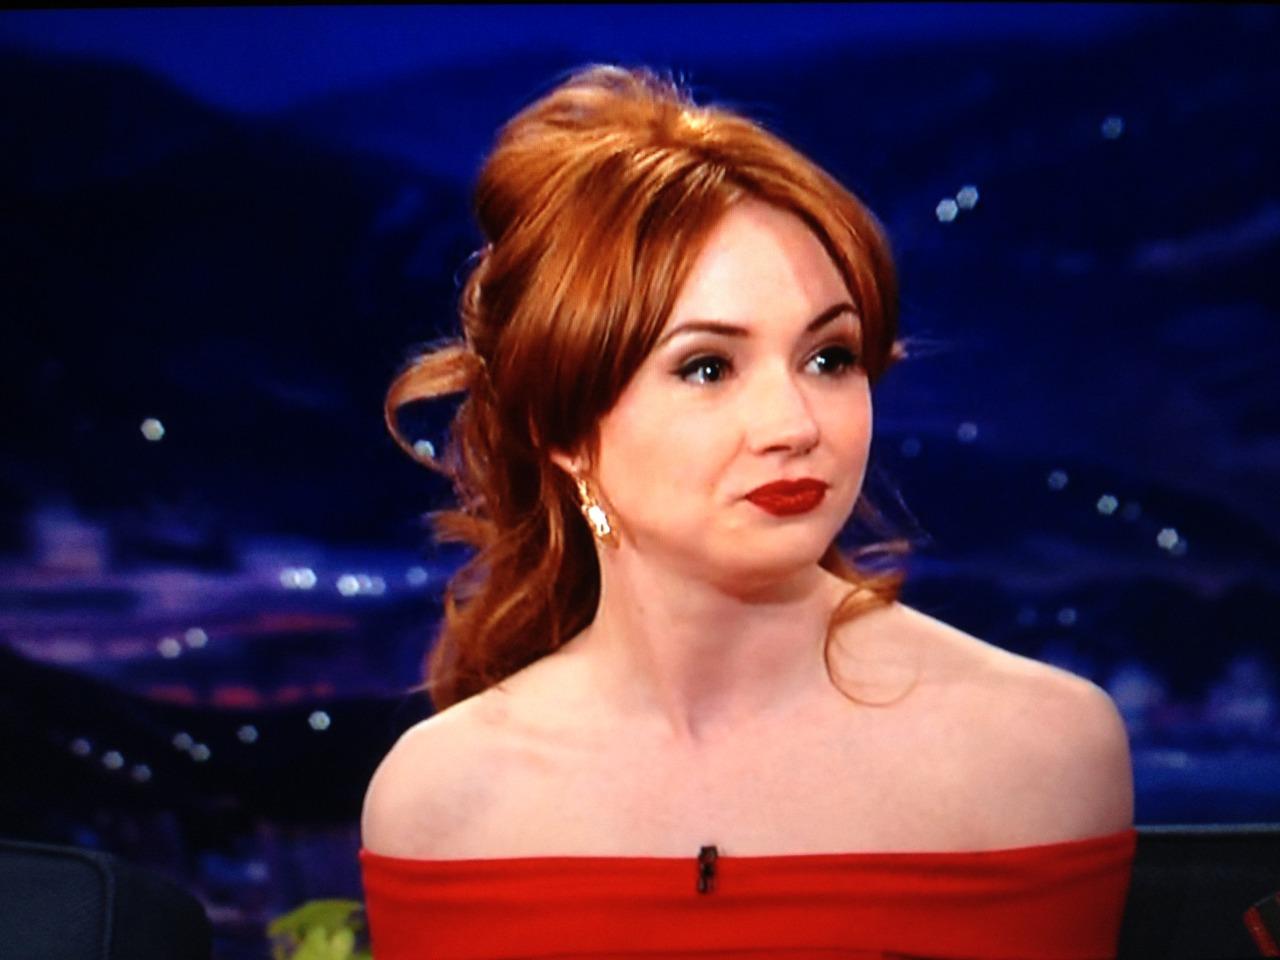 Karen Gillan Made An Appearance On The Late Night American Talk Show